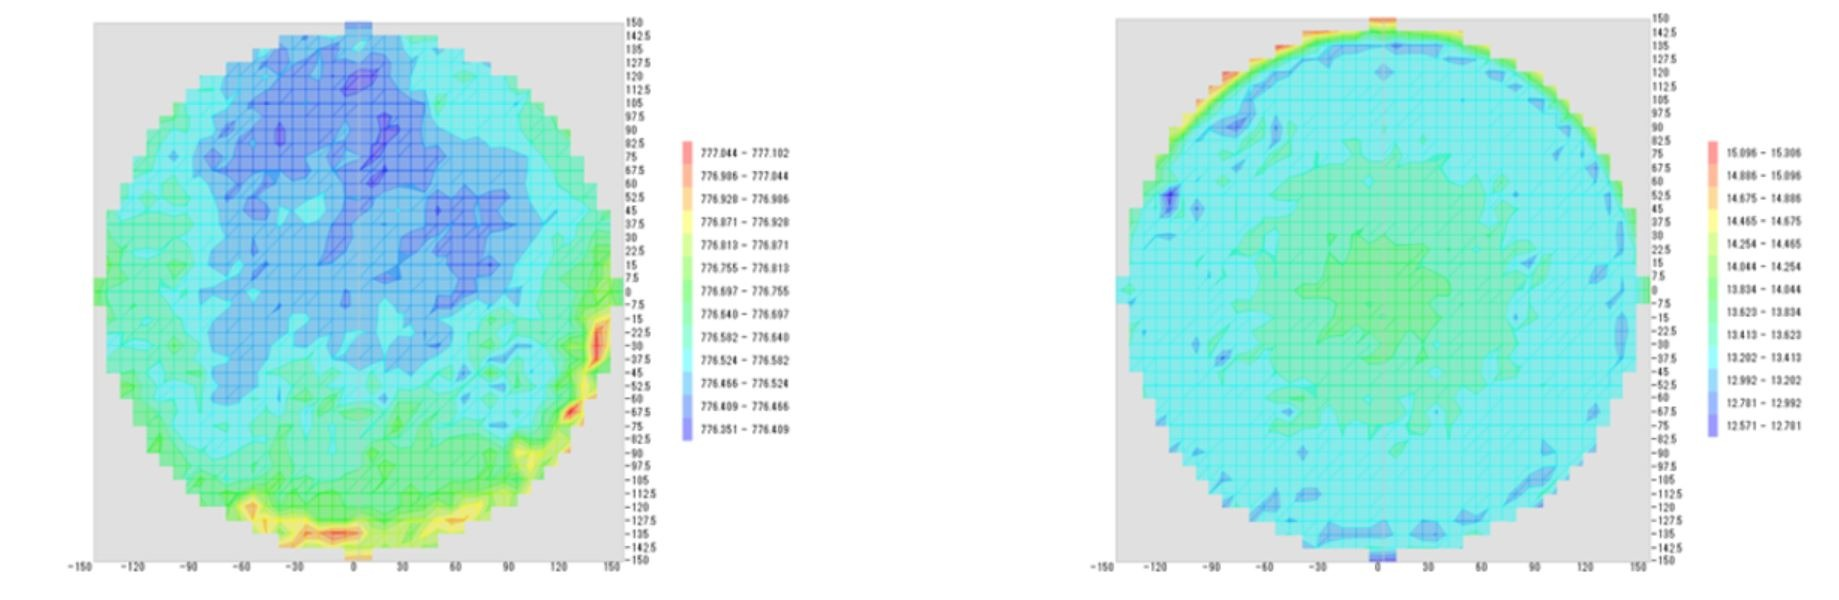 SF-3Rθ 측정 데이터 예시